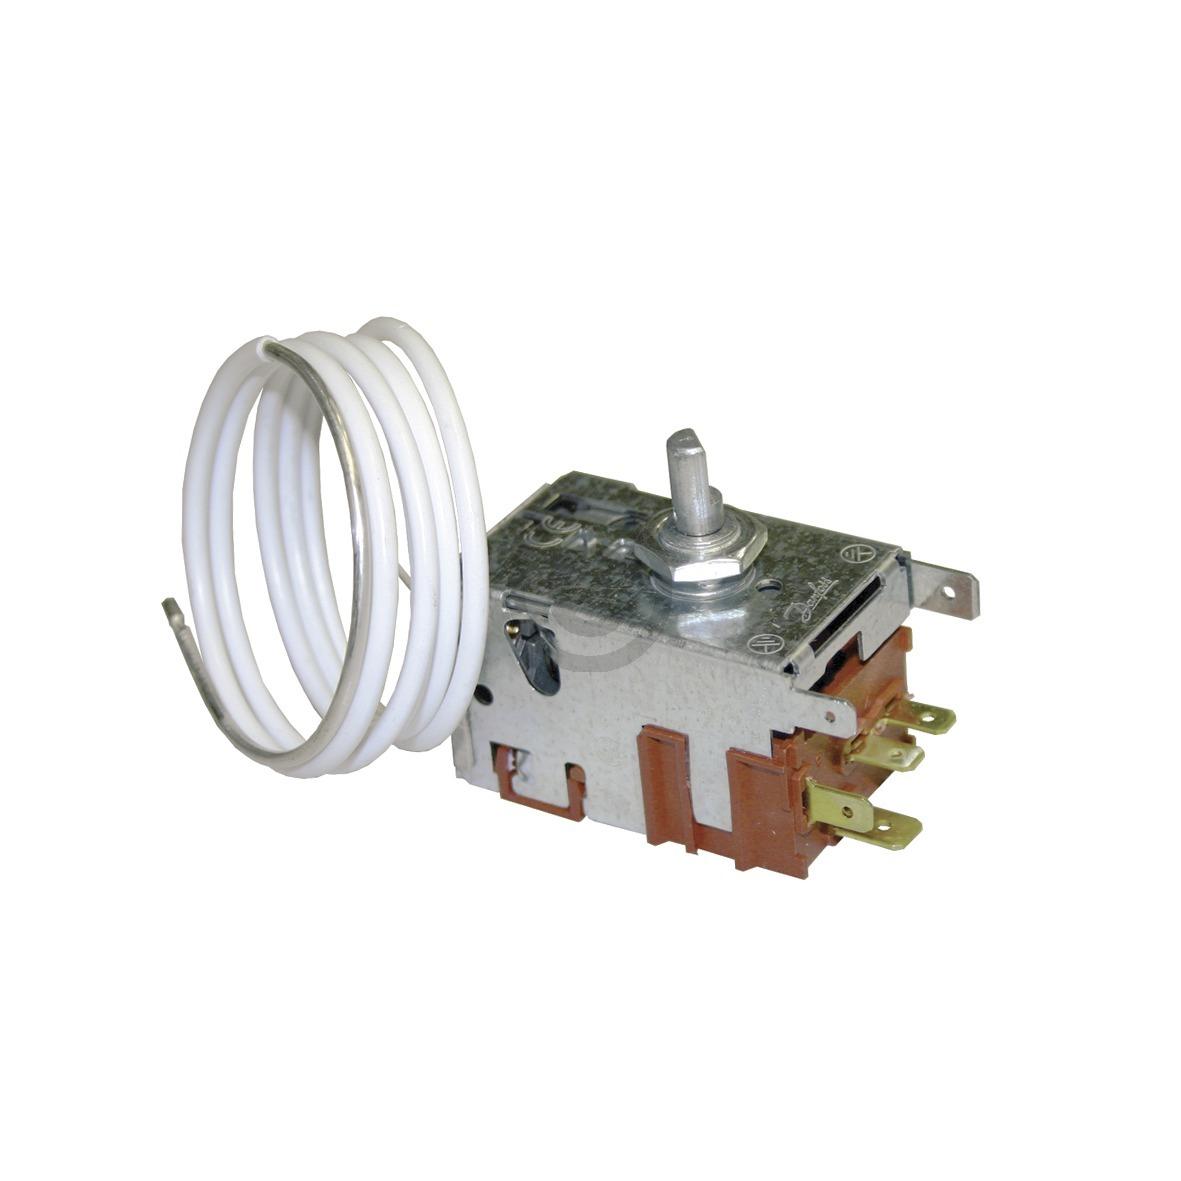 Thermostat 077B5223 Danfoss, OT! 242502127 AEG, Electrolux, Juno, Zanussi